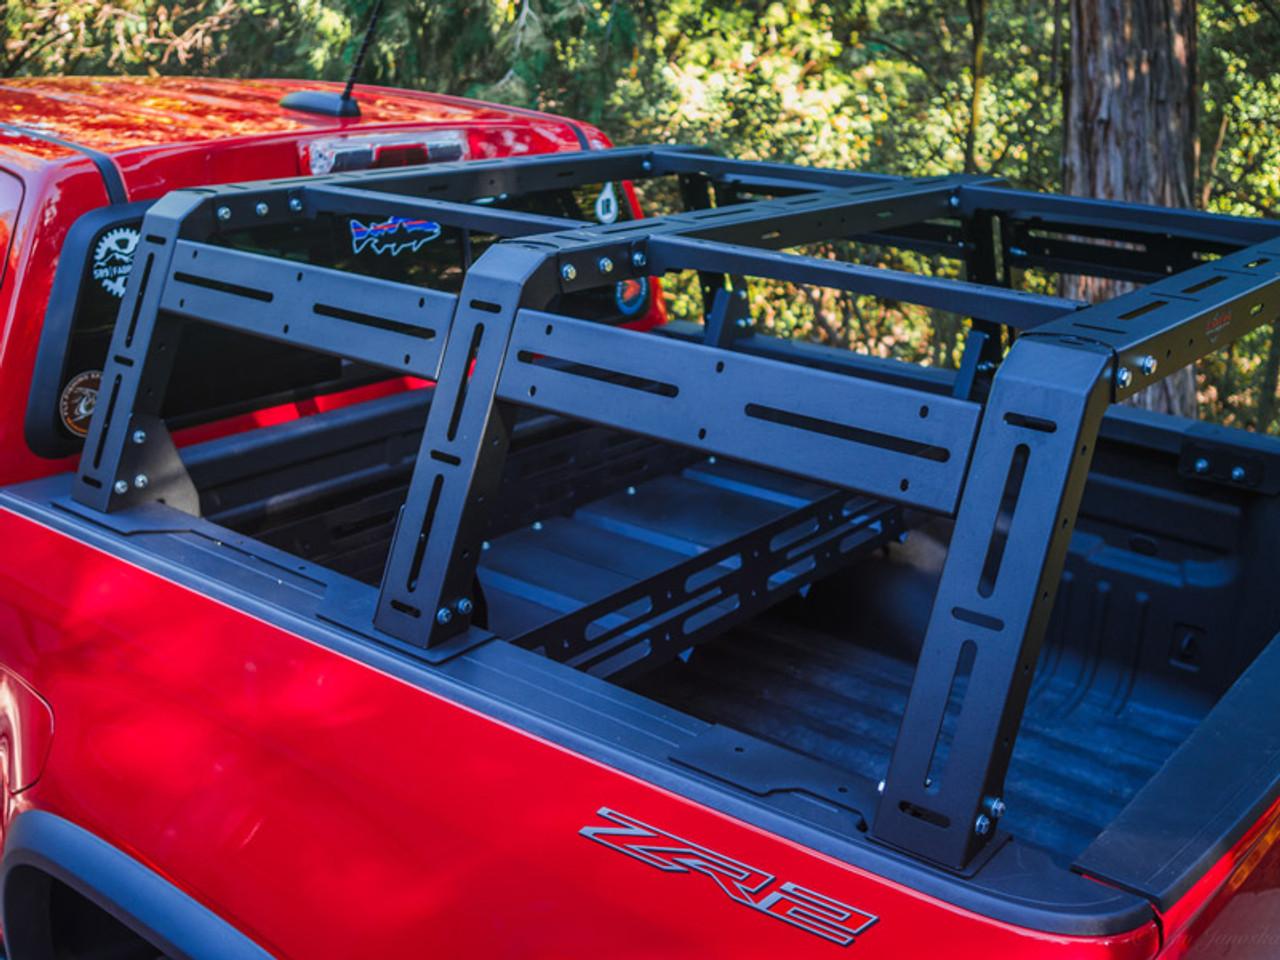 Chevy Colorado Gmc Canyon Base Station Bed Rack 16 Datin Metal